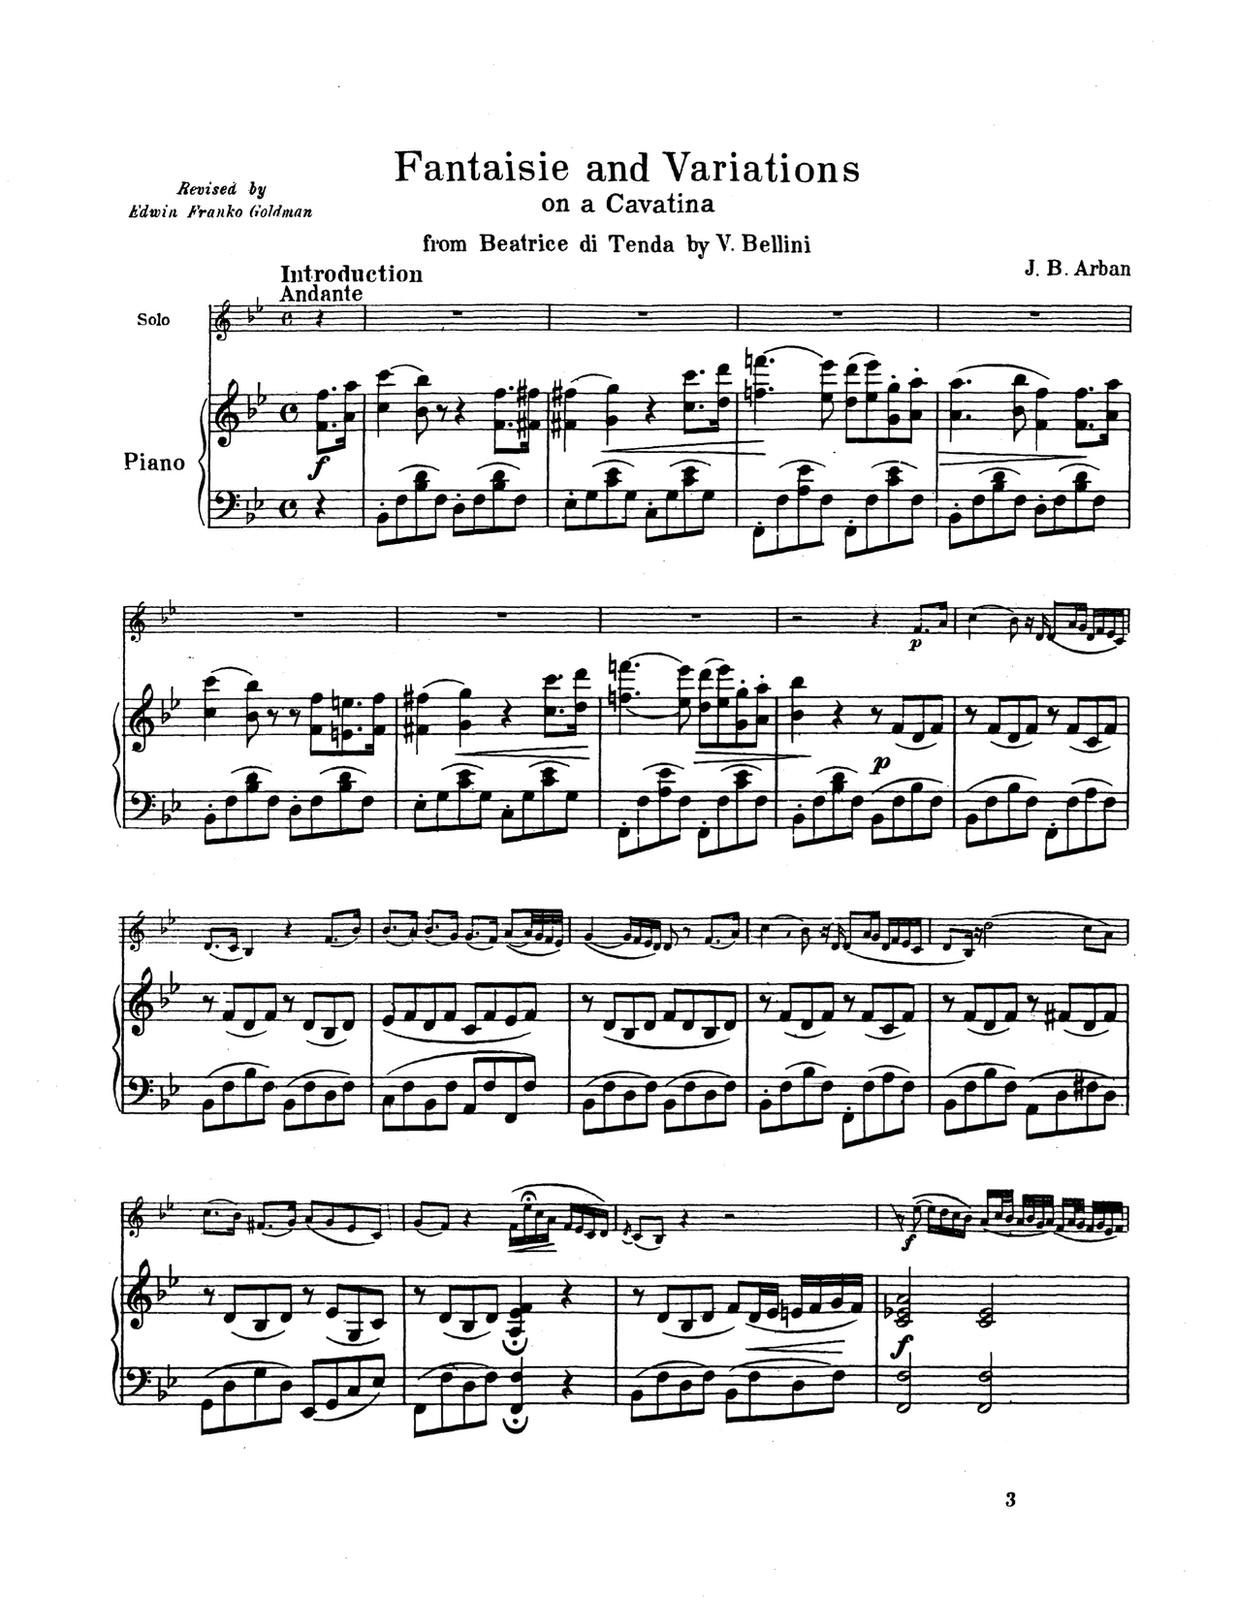 Arban, Fantasies and Airs Piano Accompaniment 4